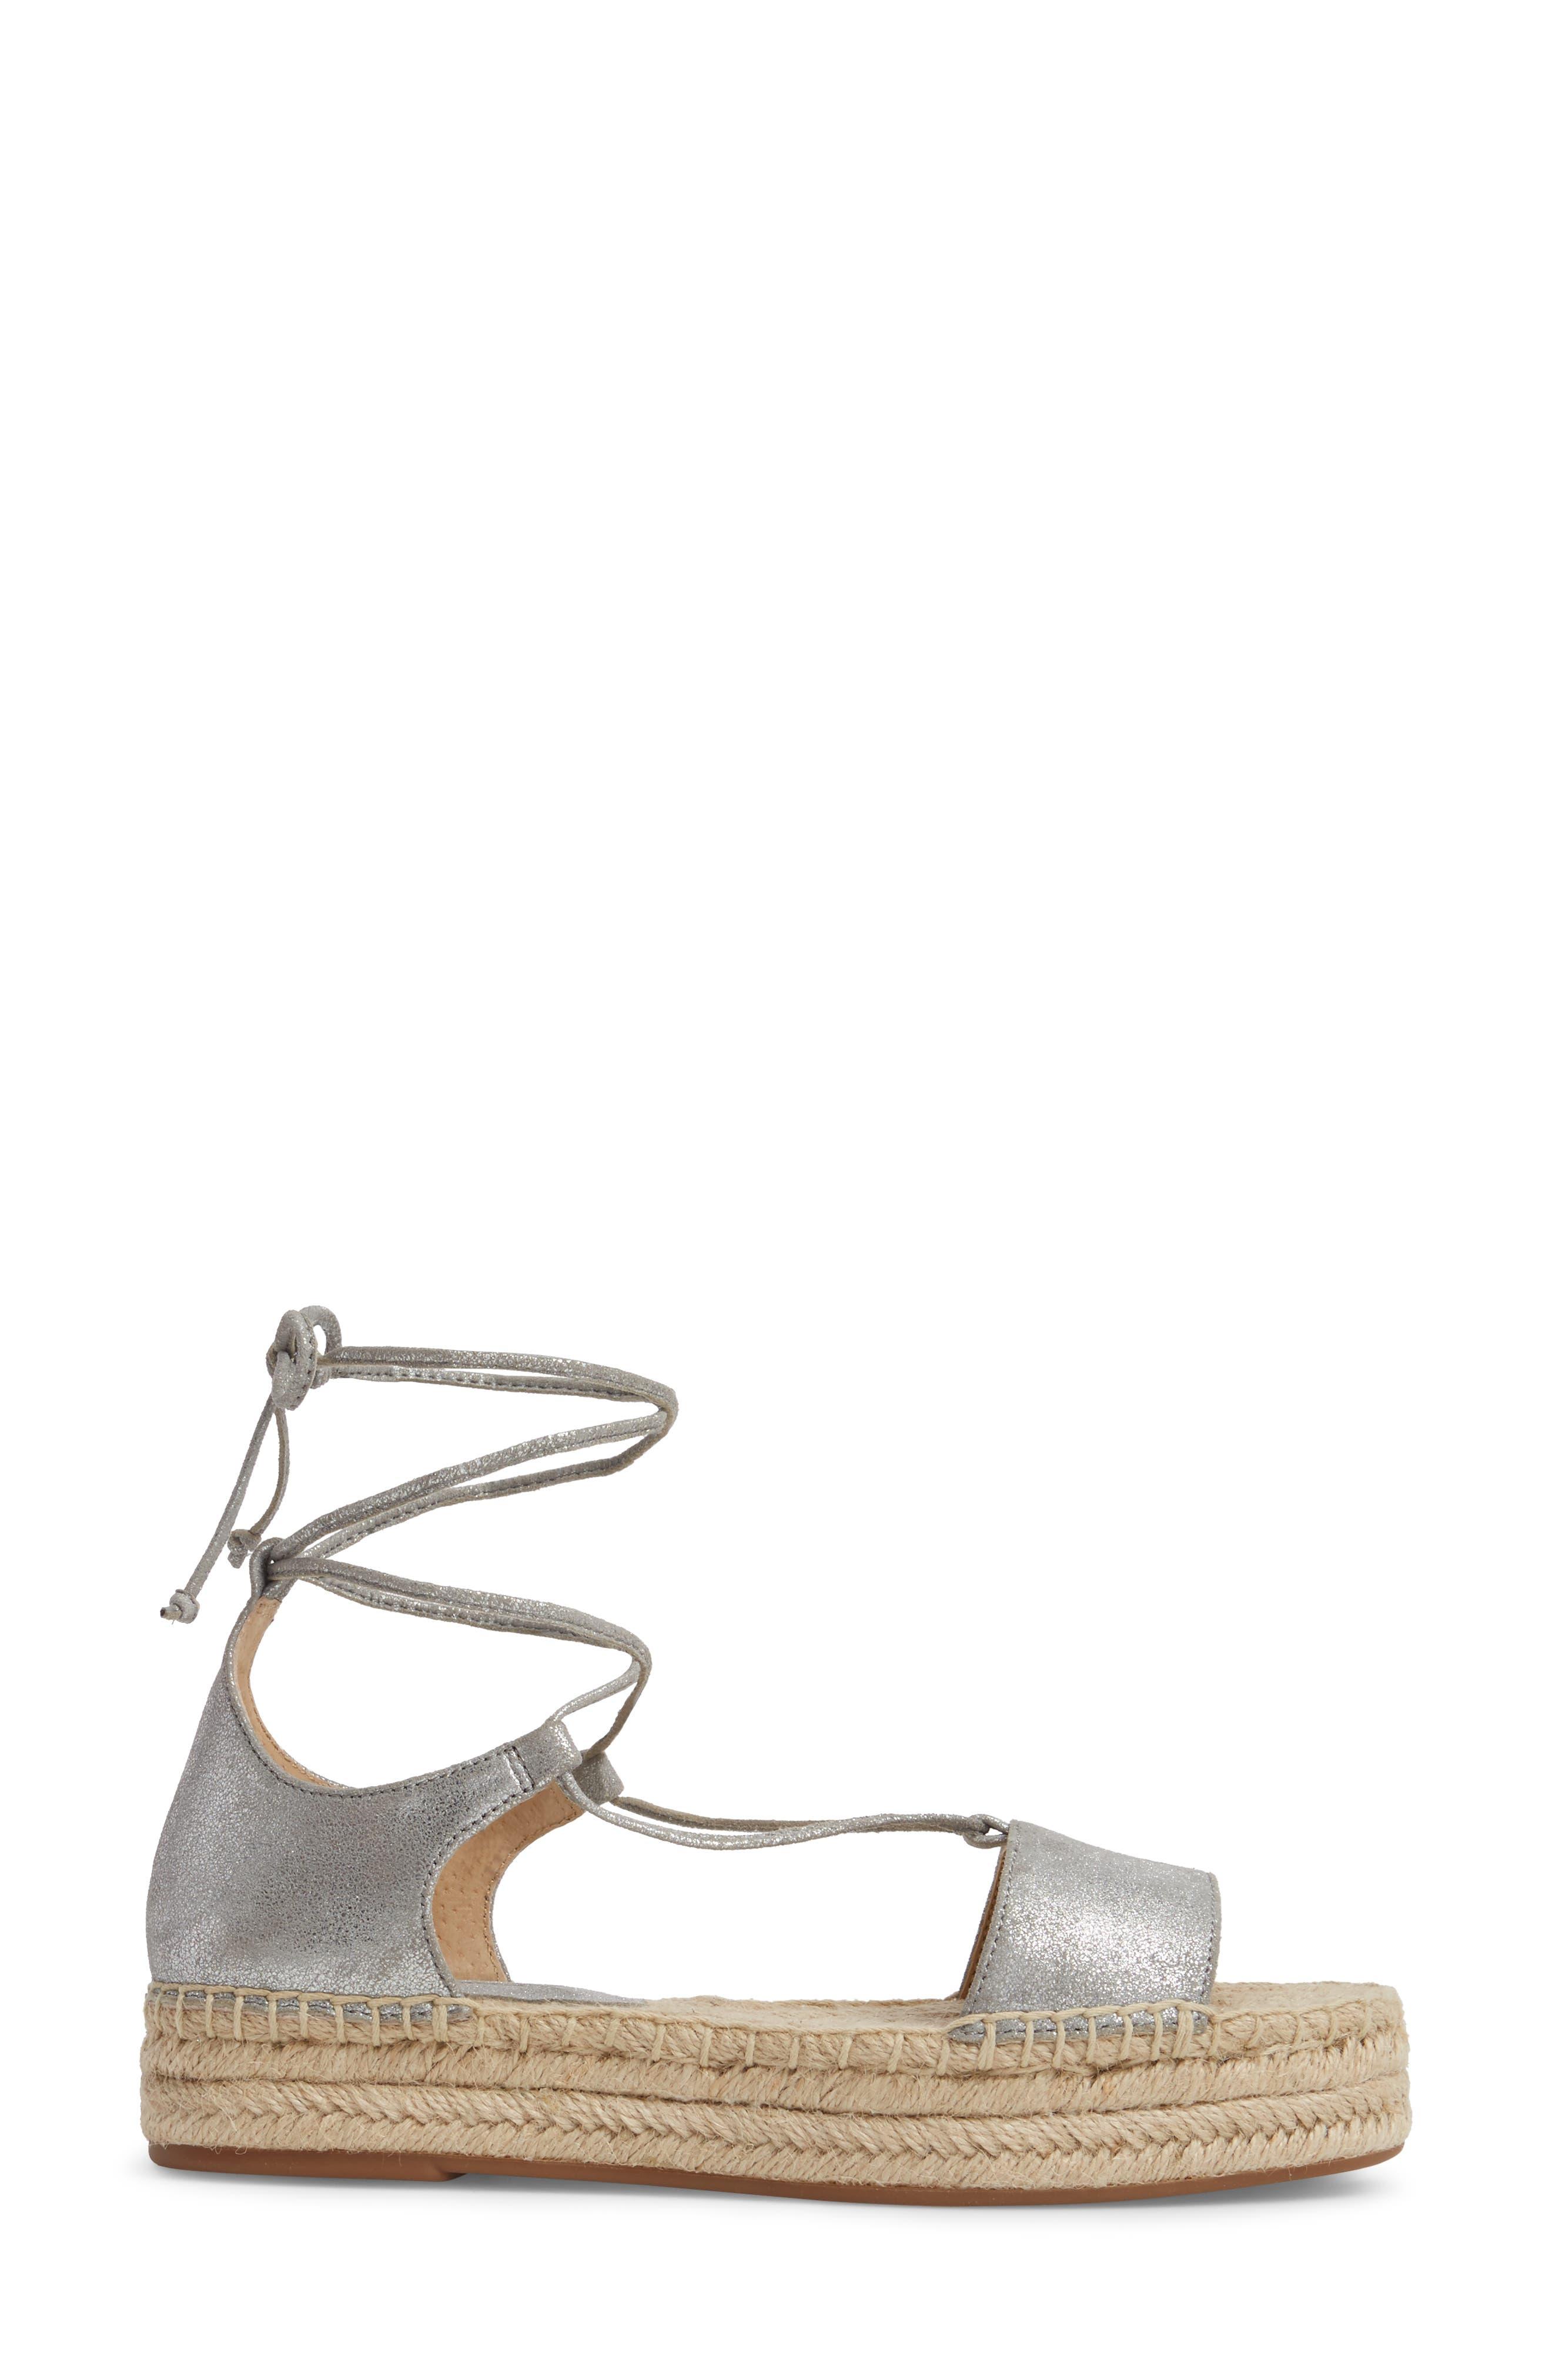 Fernanda Wraparound Platform Sandal,                             Alternate thumbnail 3, color,                             SILVER SUEDE